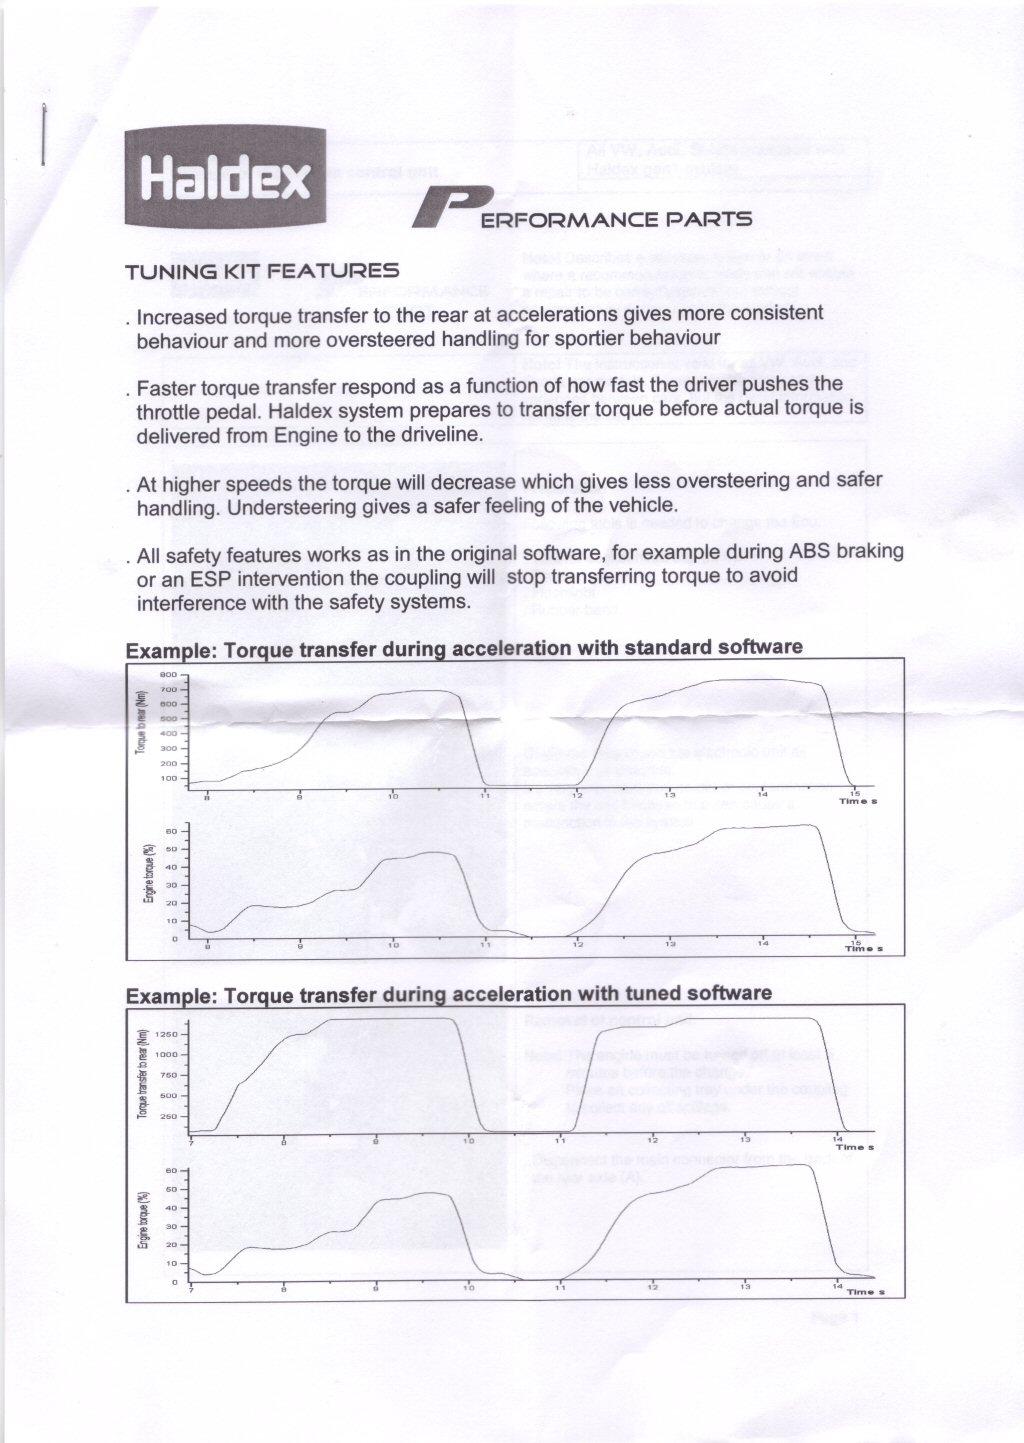 Audi Tt Haldex Wiring Diagram | Wiring Liry Haldex Wiring Harness Diagram on